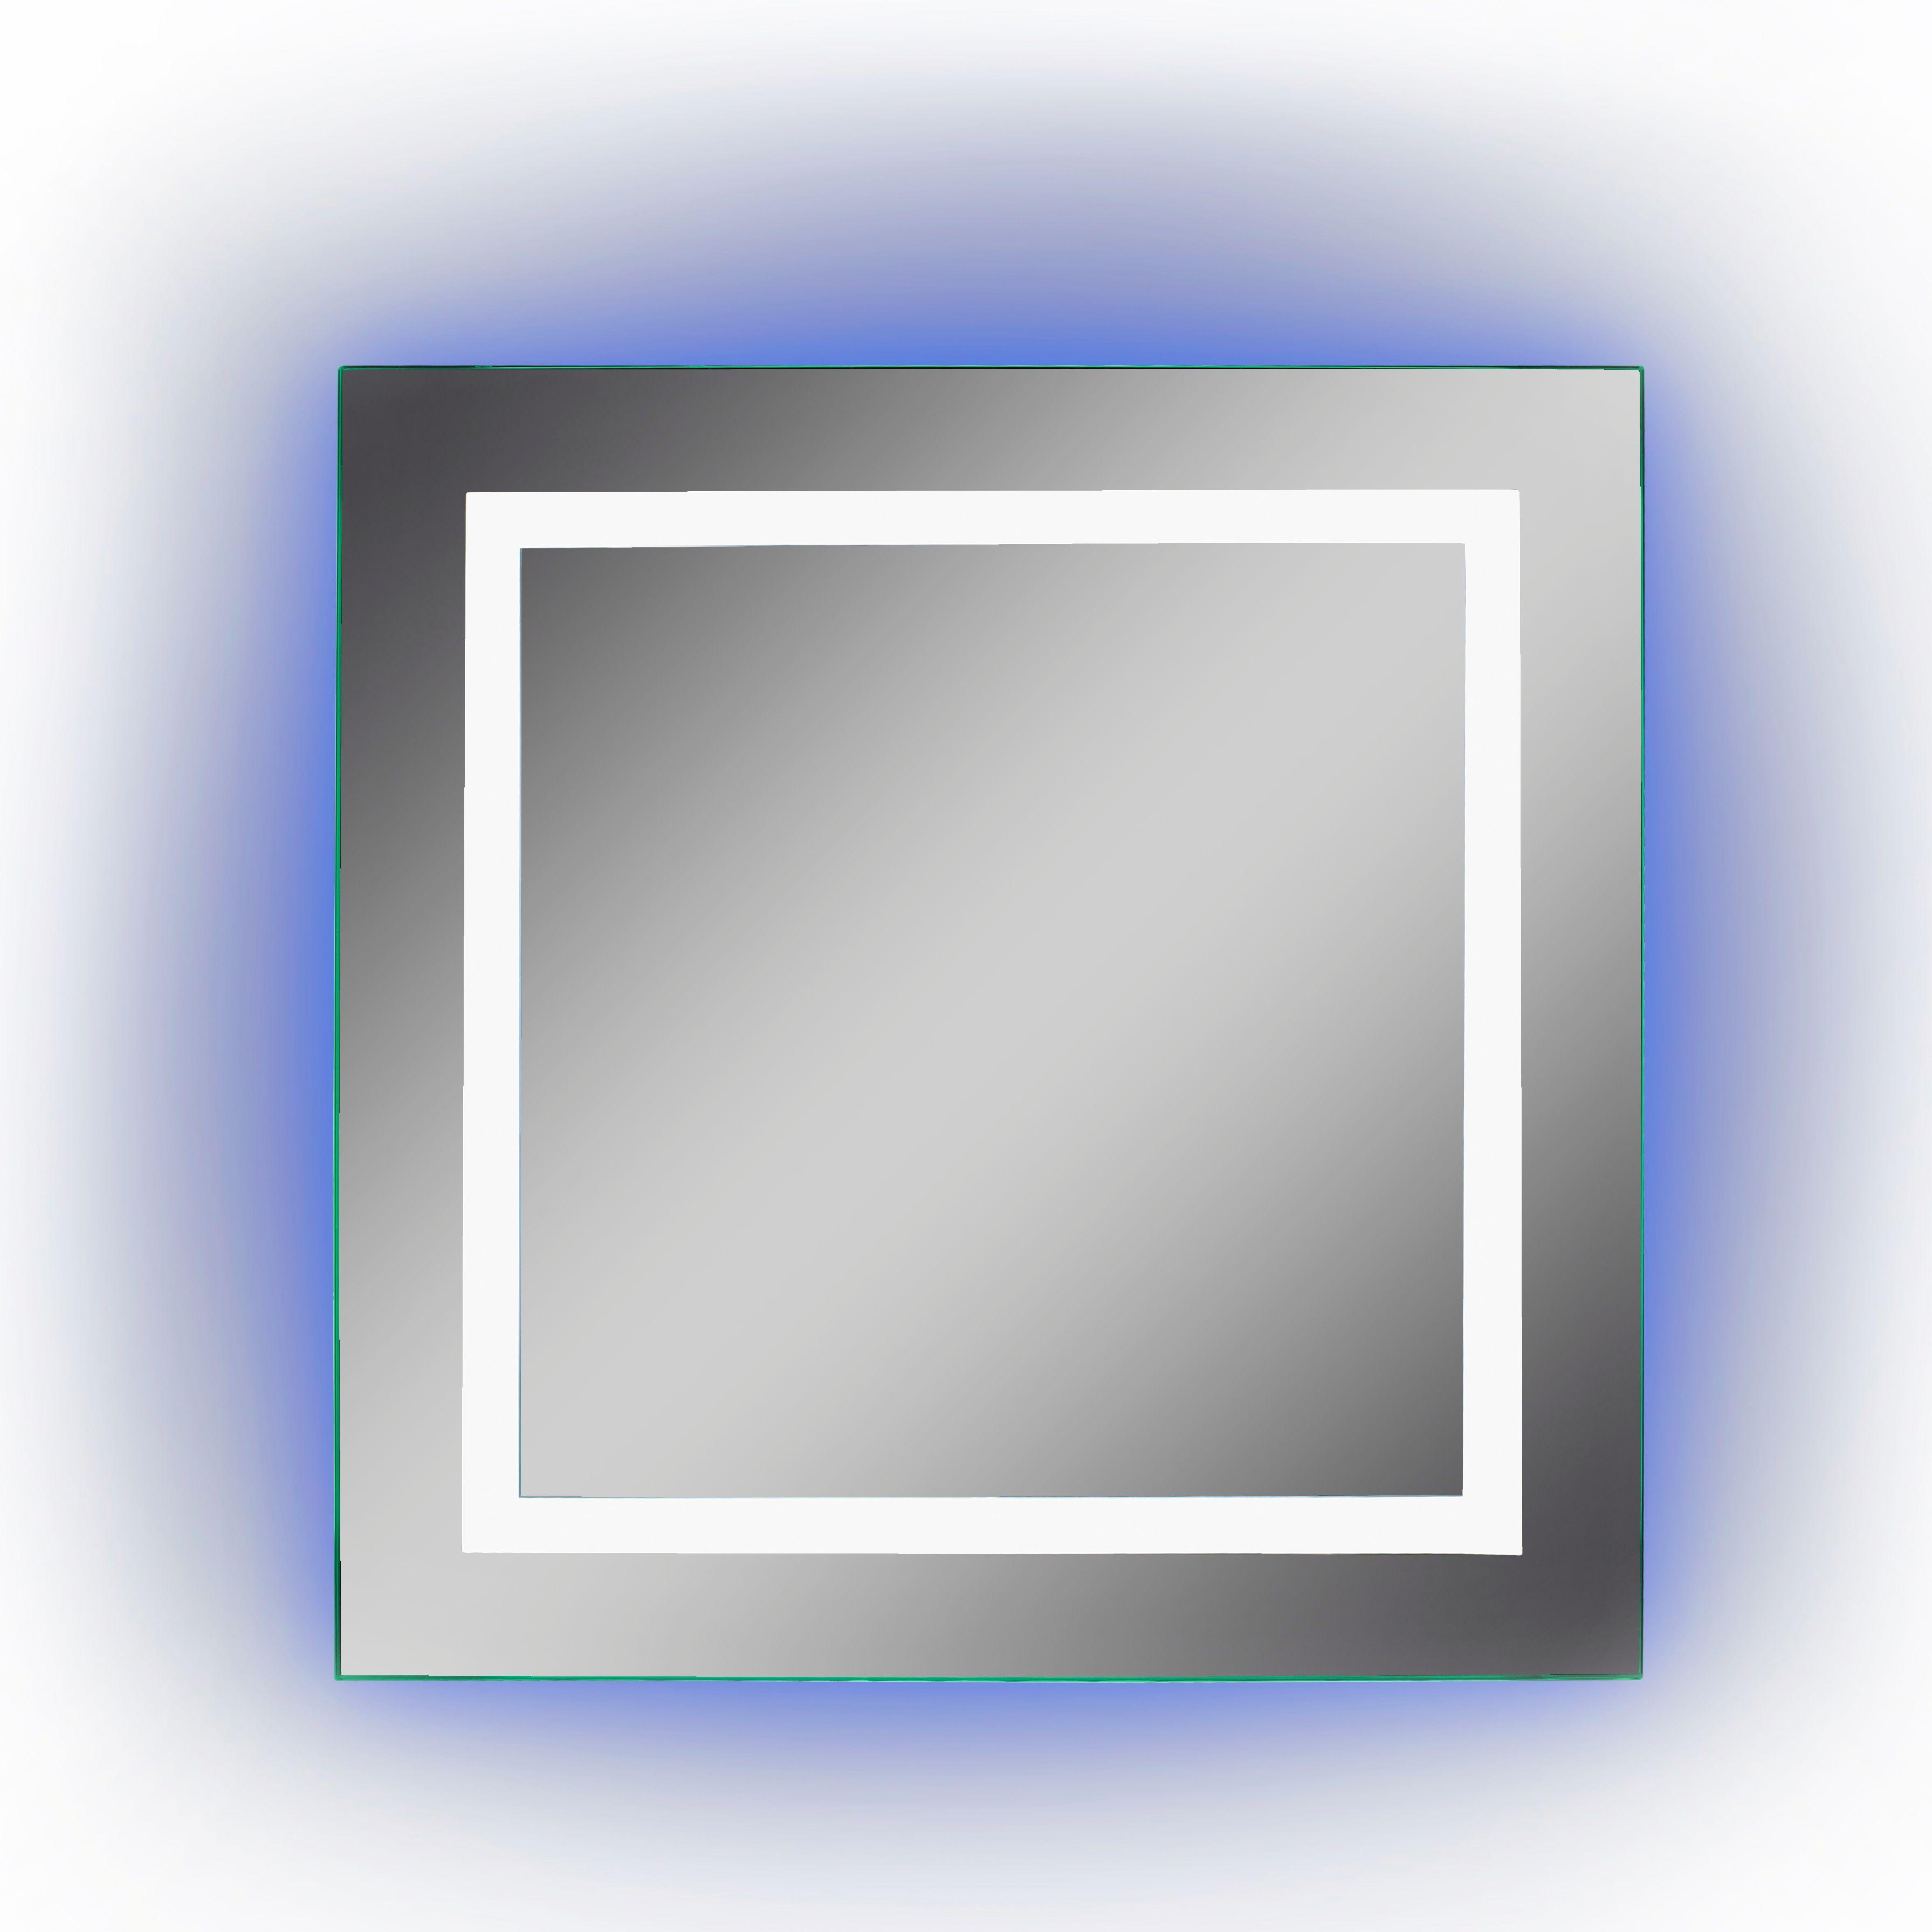 Lumino Calando Illuminated Bathroom Square Colour Changing Mirror (w)600mm (h)600mm